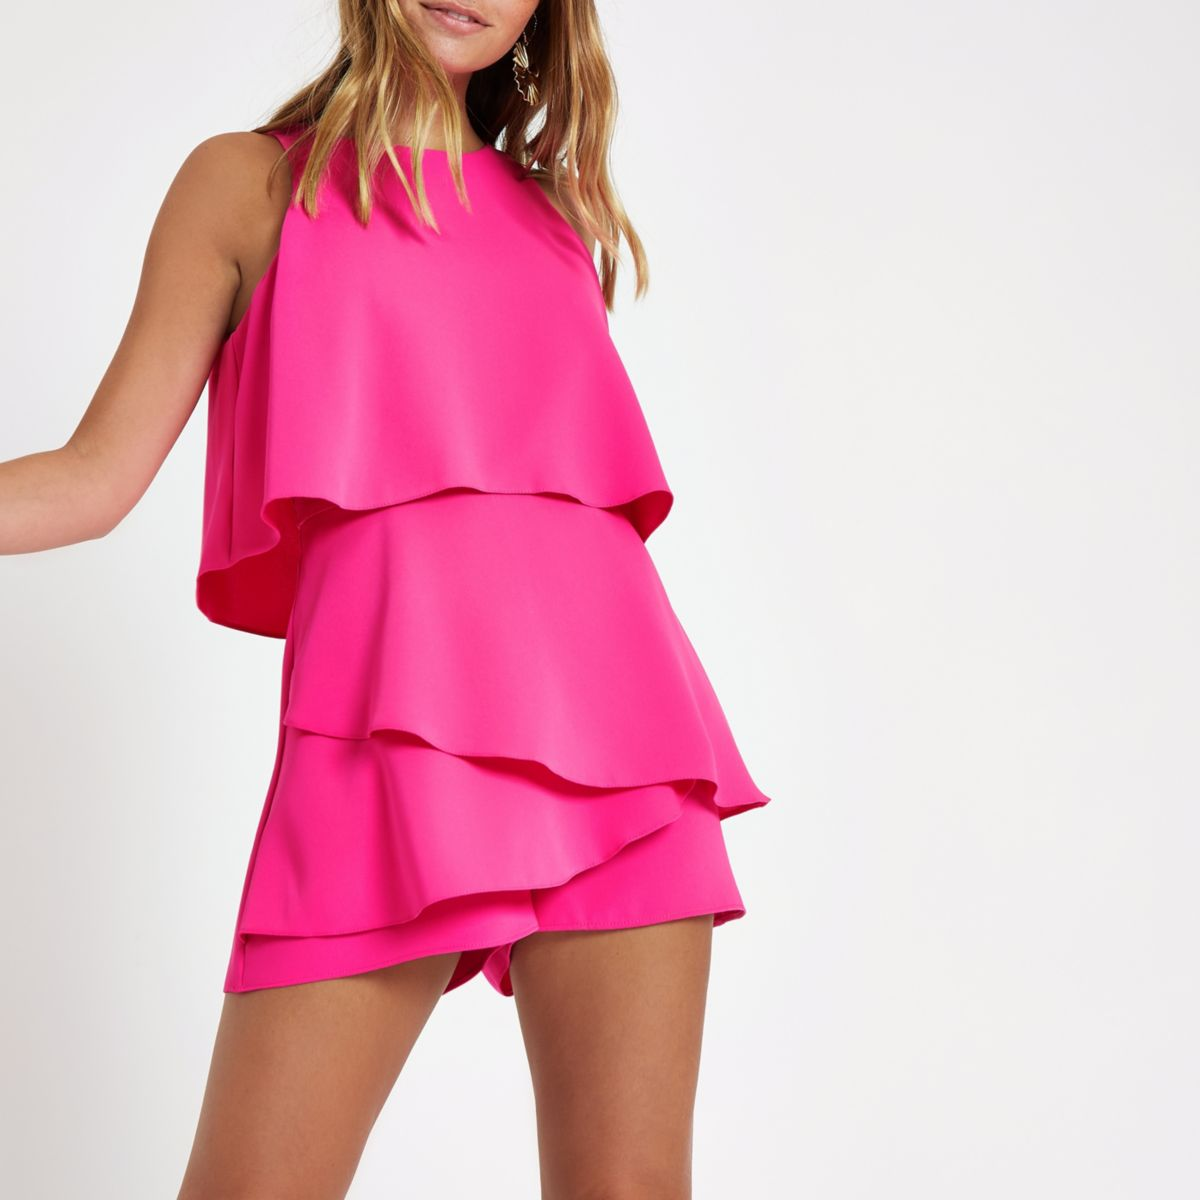 Petite bright pink tiered sleeveless romper